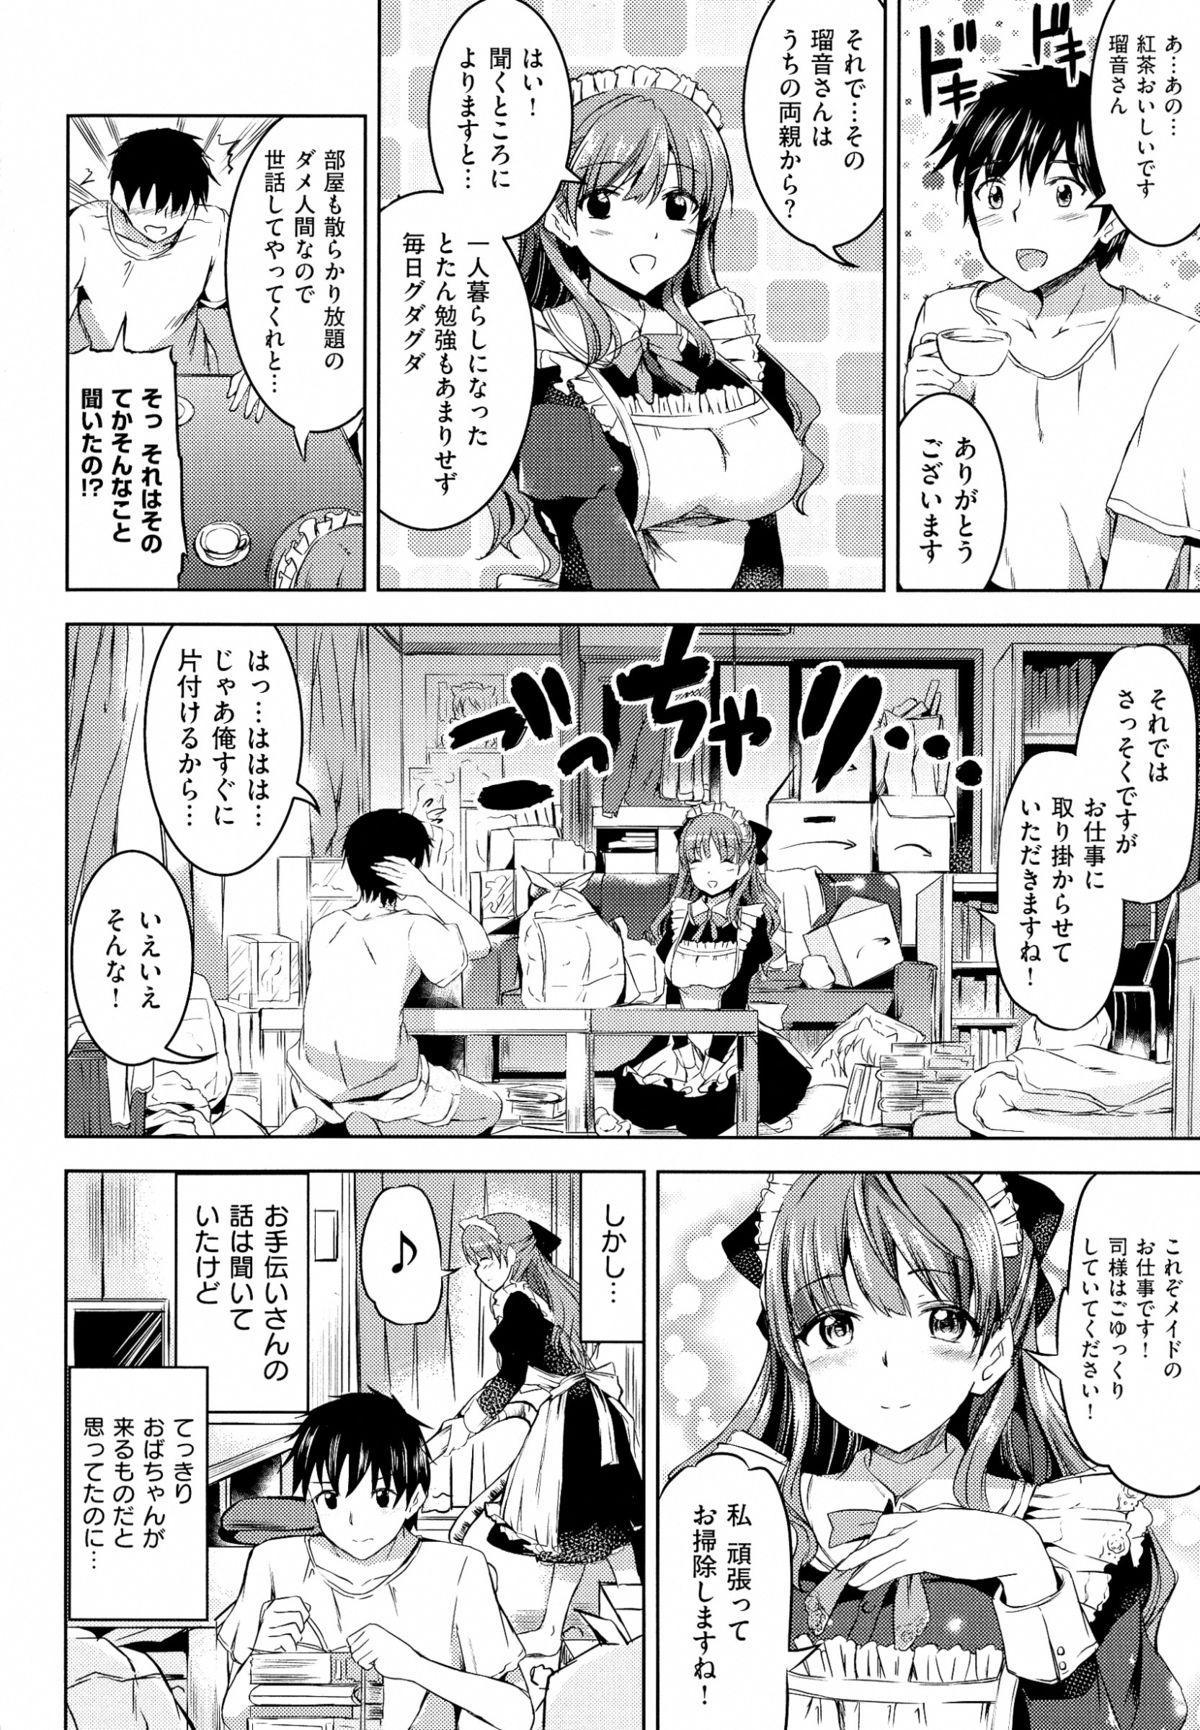 Ojousama no Maid Jijou 61